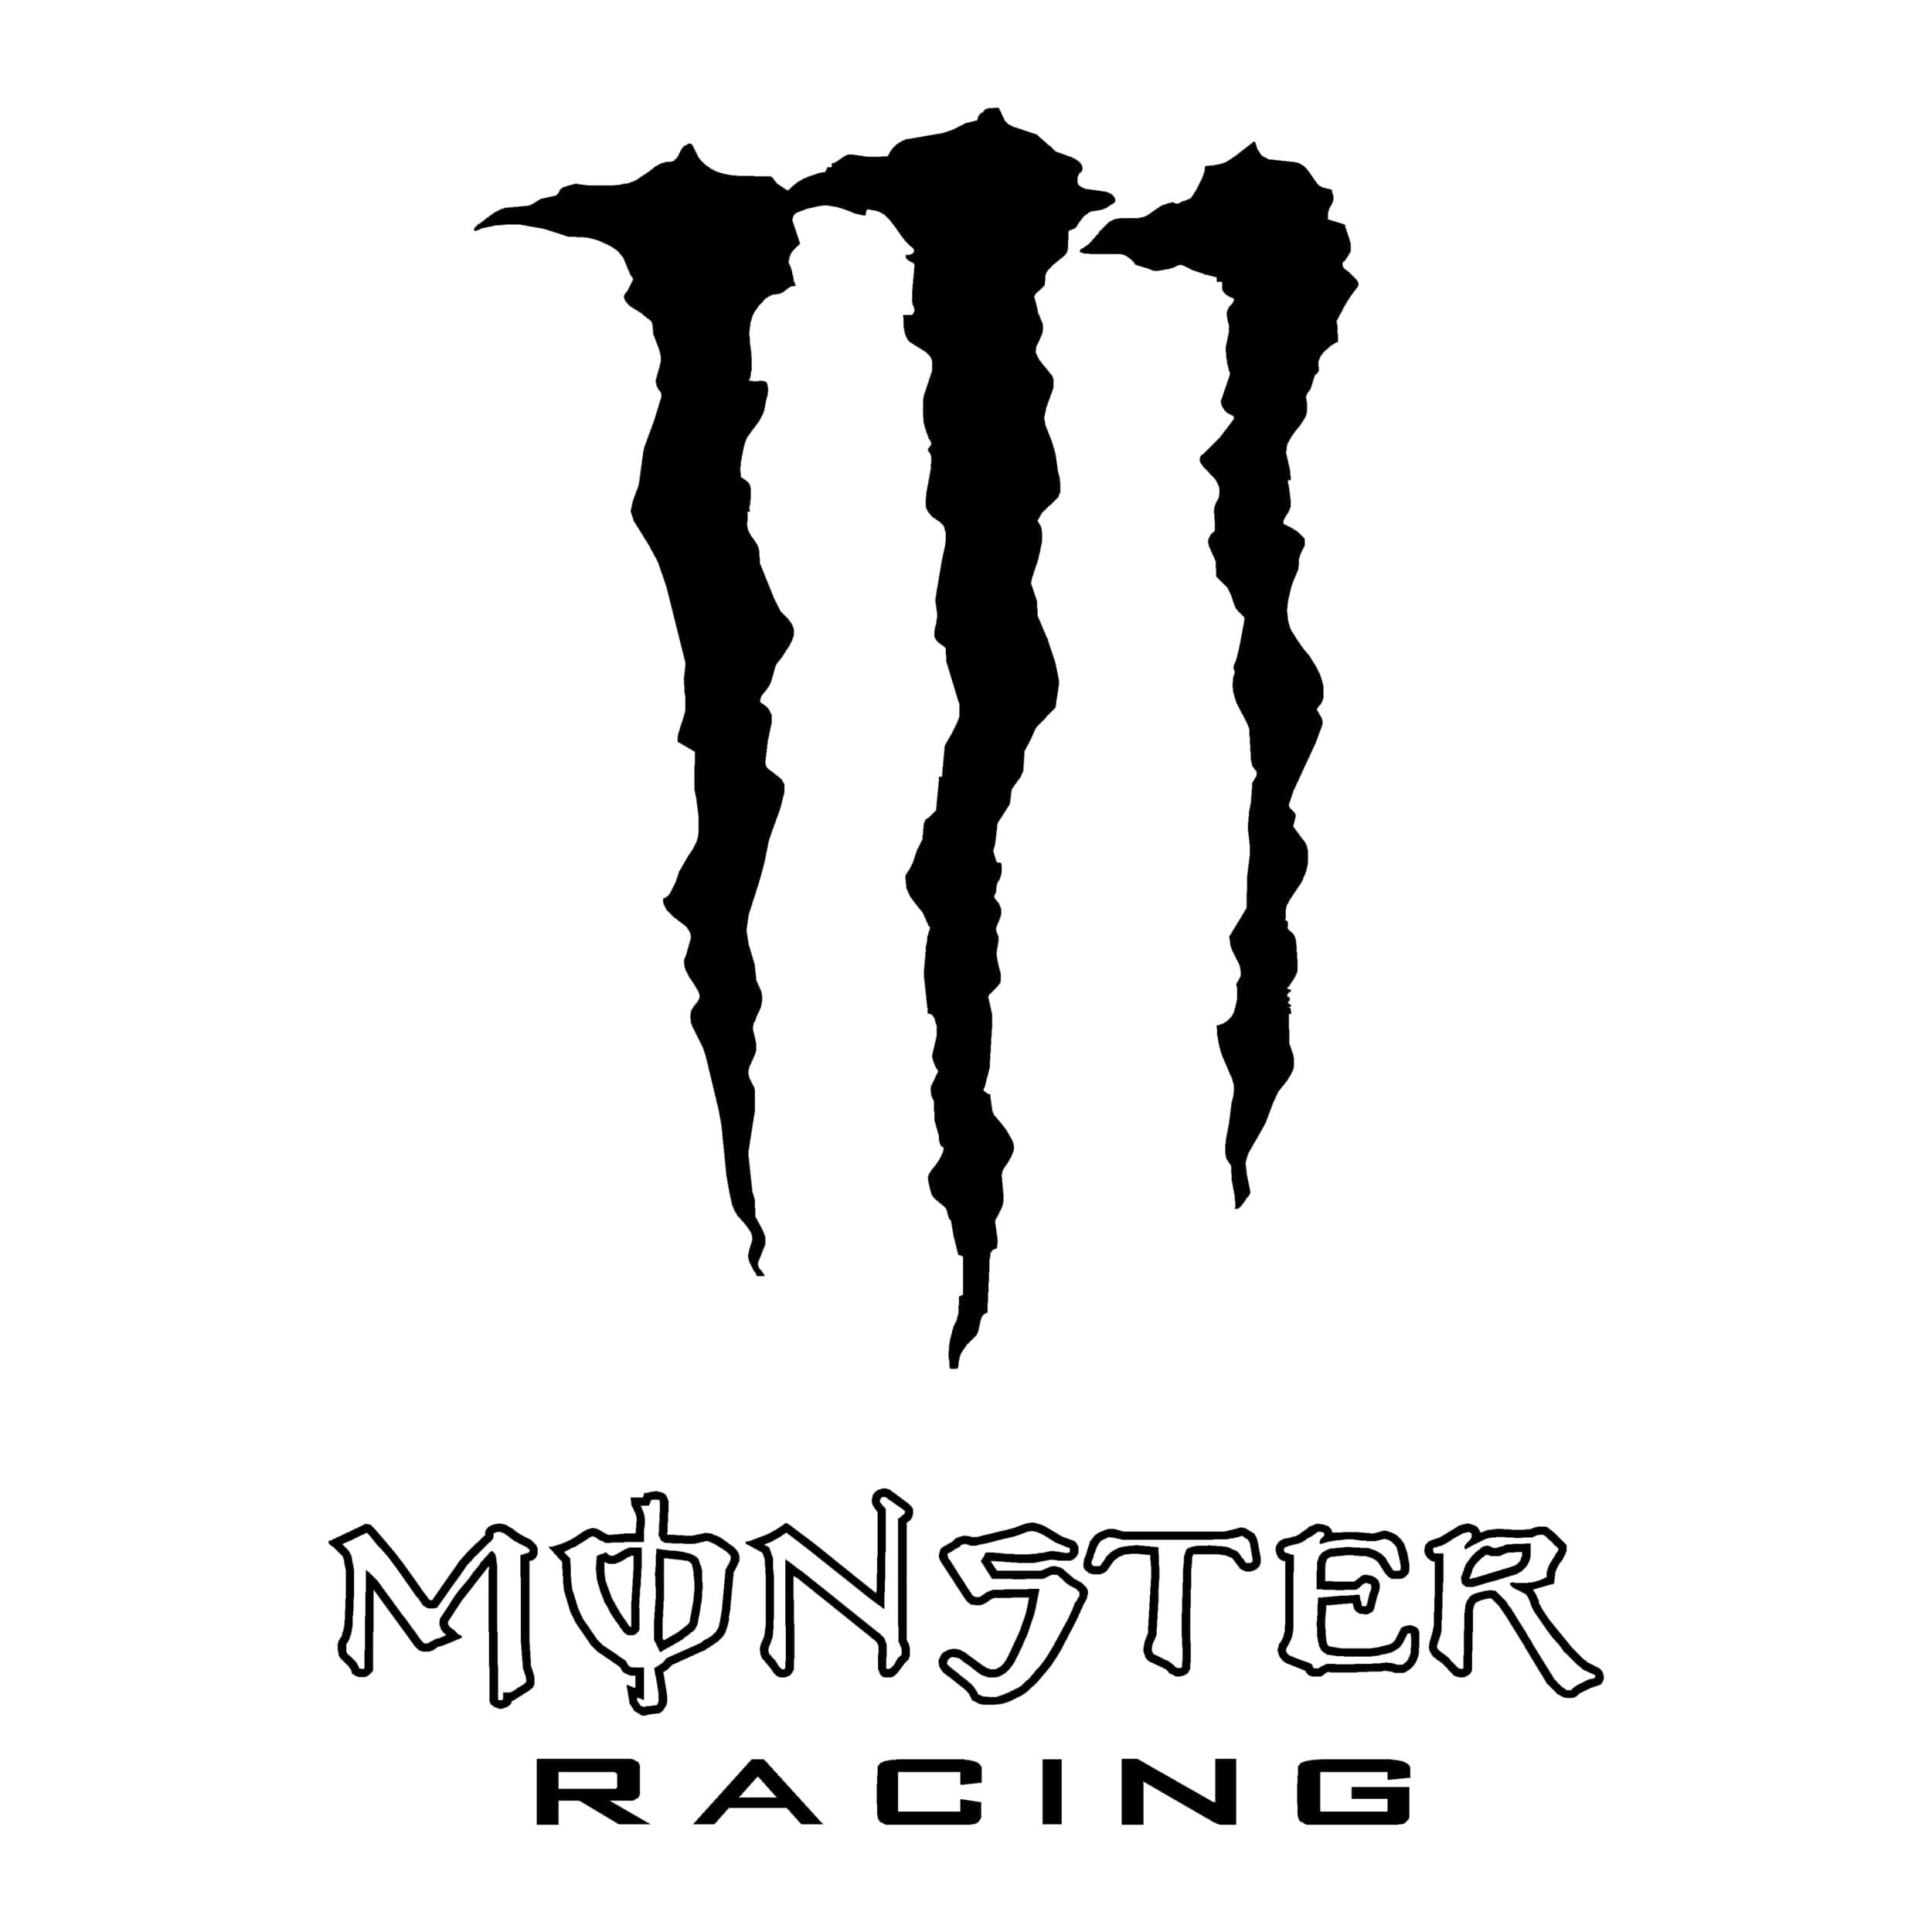 stickers-monster-racing-ref-1-tuning-audio-sonorisation-autocollant-sticker-sponsors-car-auto-moto-camion-competition-deco-rallye-min